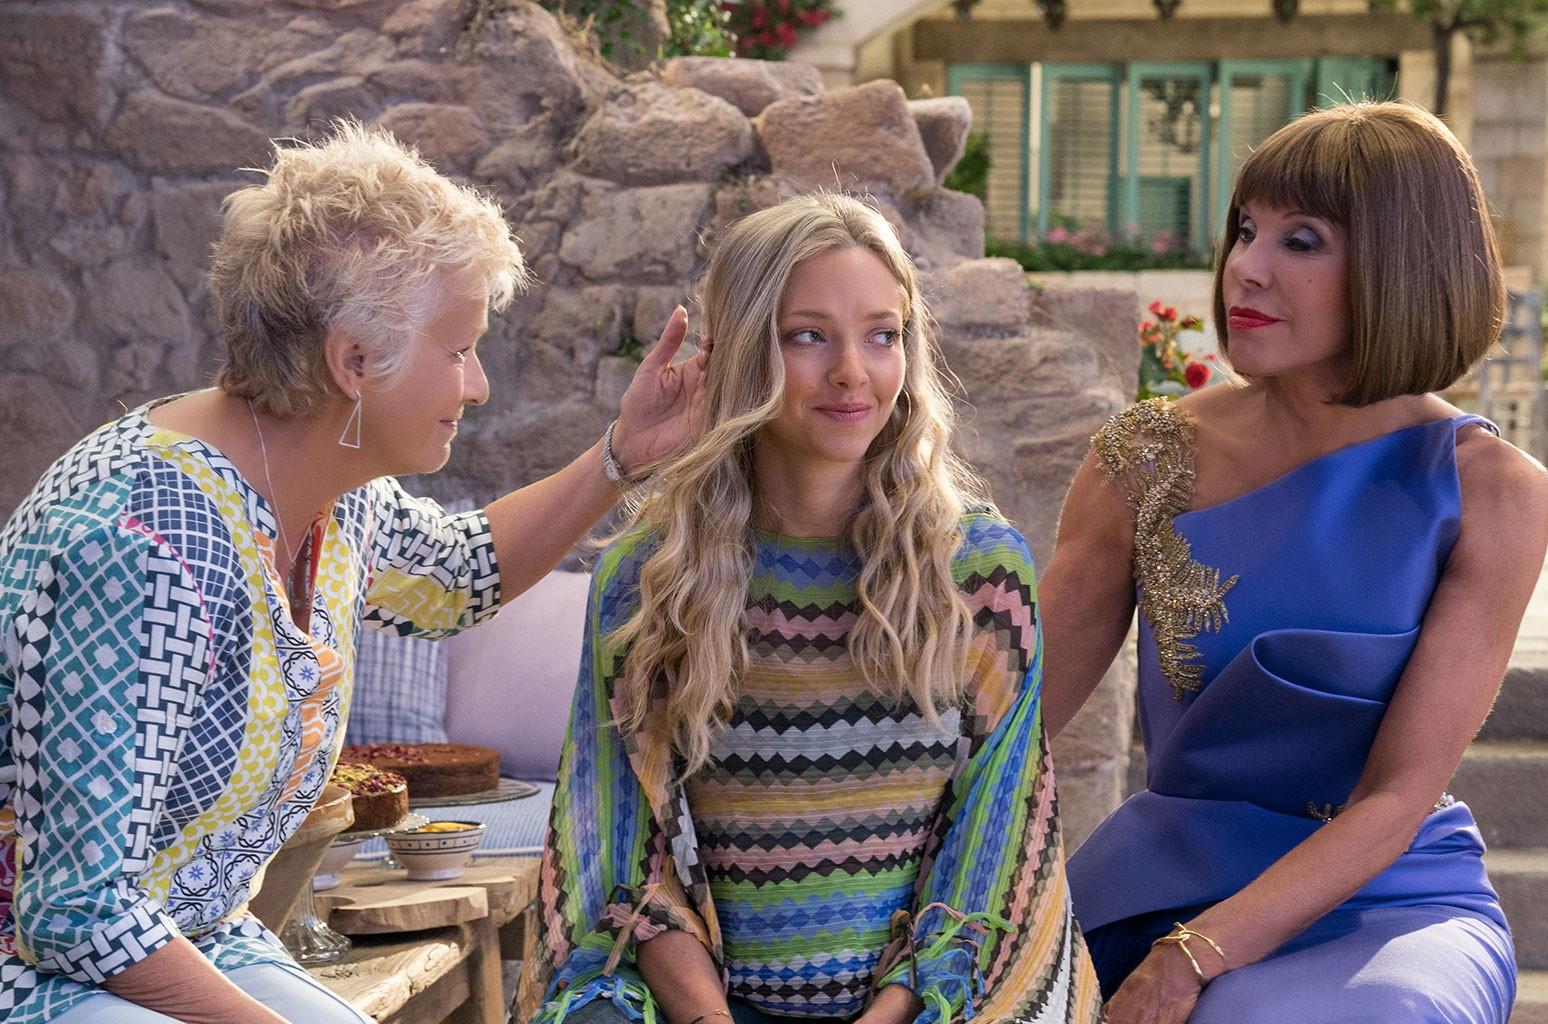 L - R: 'Mamma Mia! Here We Go Again' stars Christine Baranski, Amanda Seyfried and Julie Walters